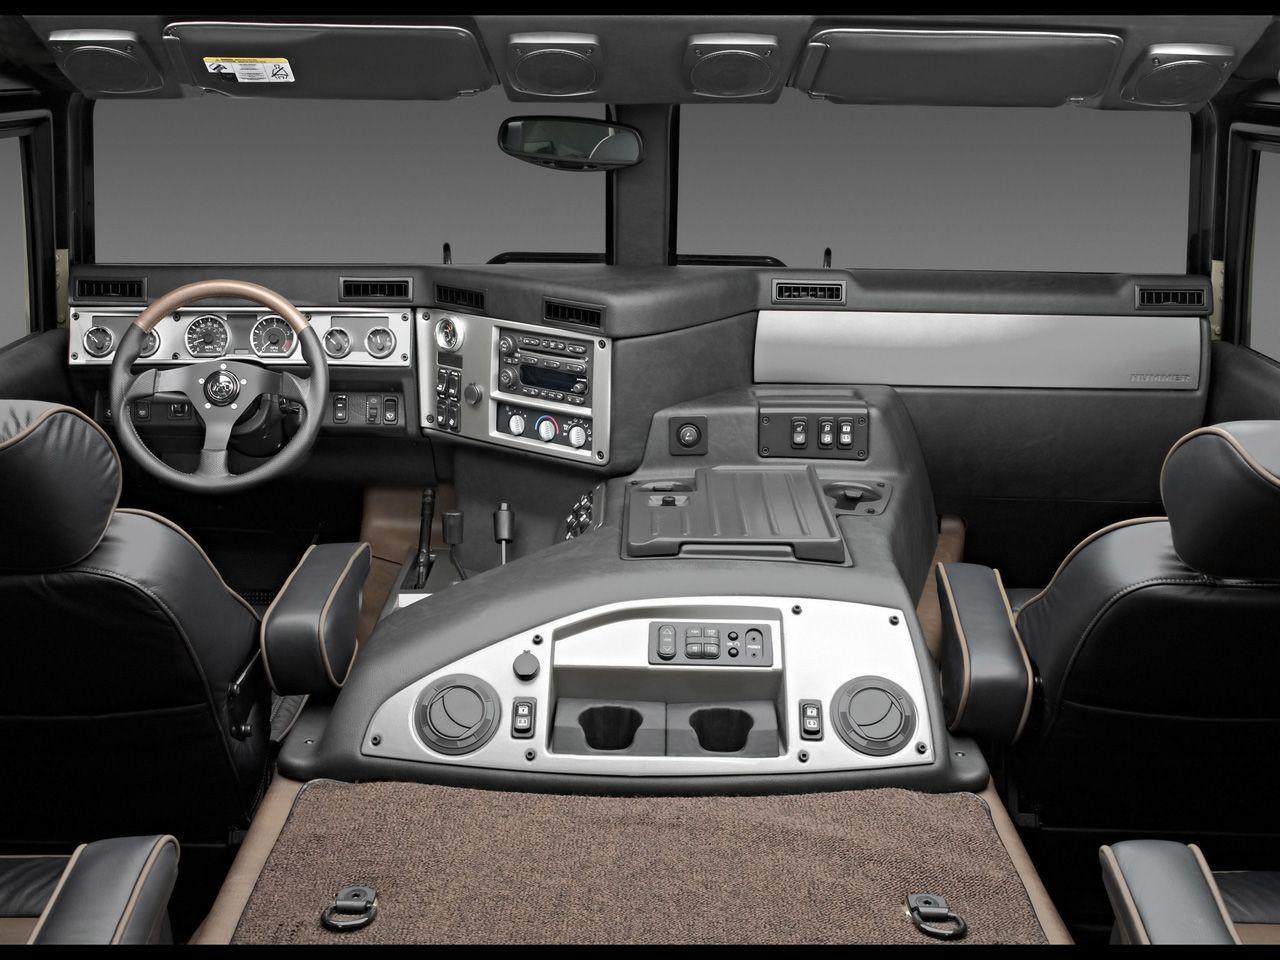 hummer interiors   2004 hummer h1 interior rear seats view 1280x960 ...